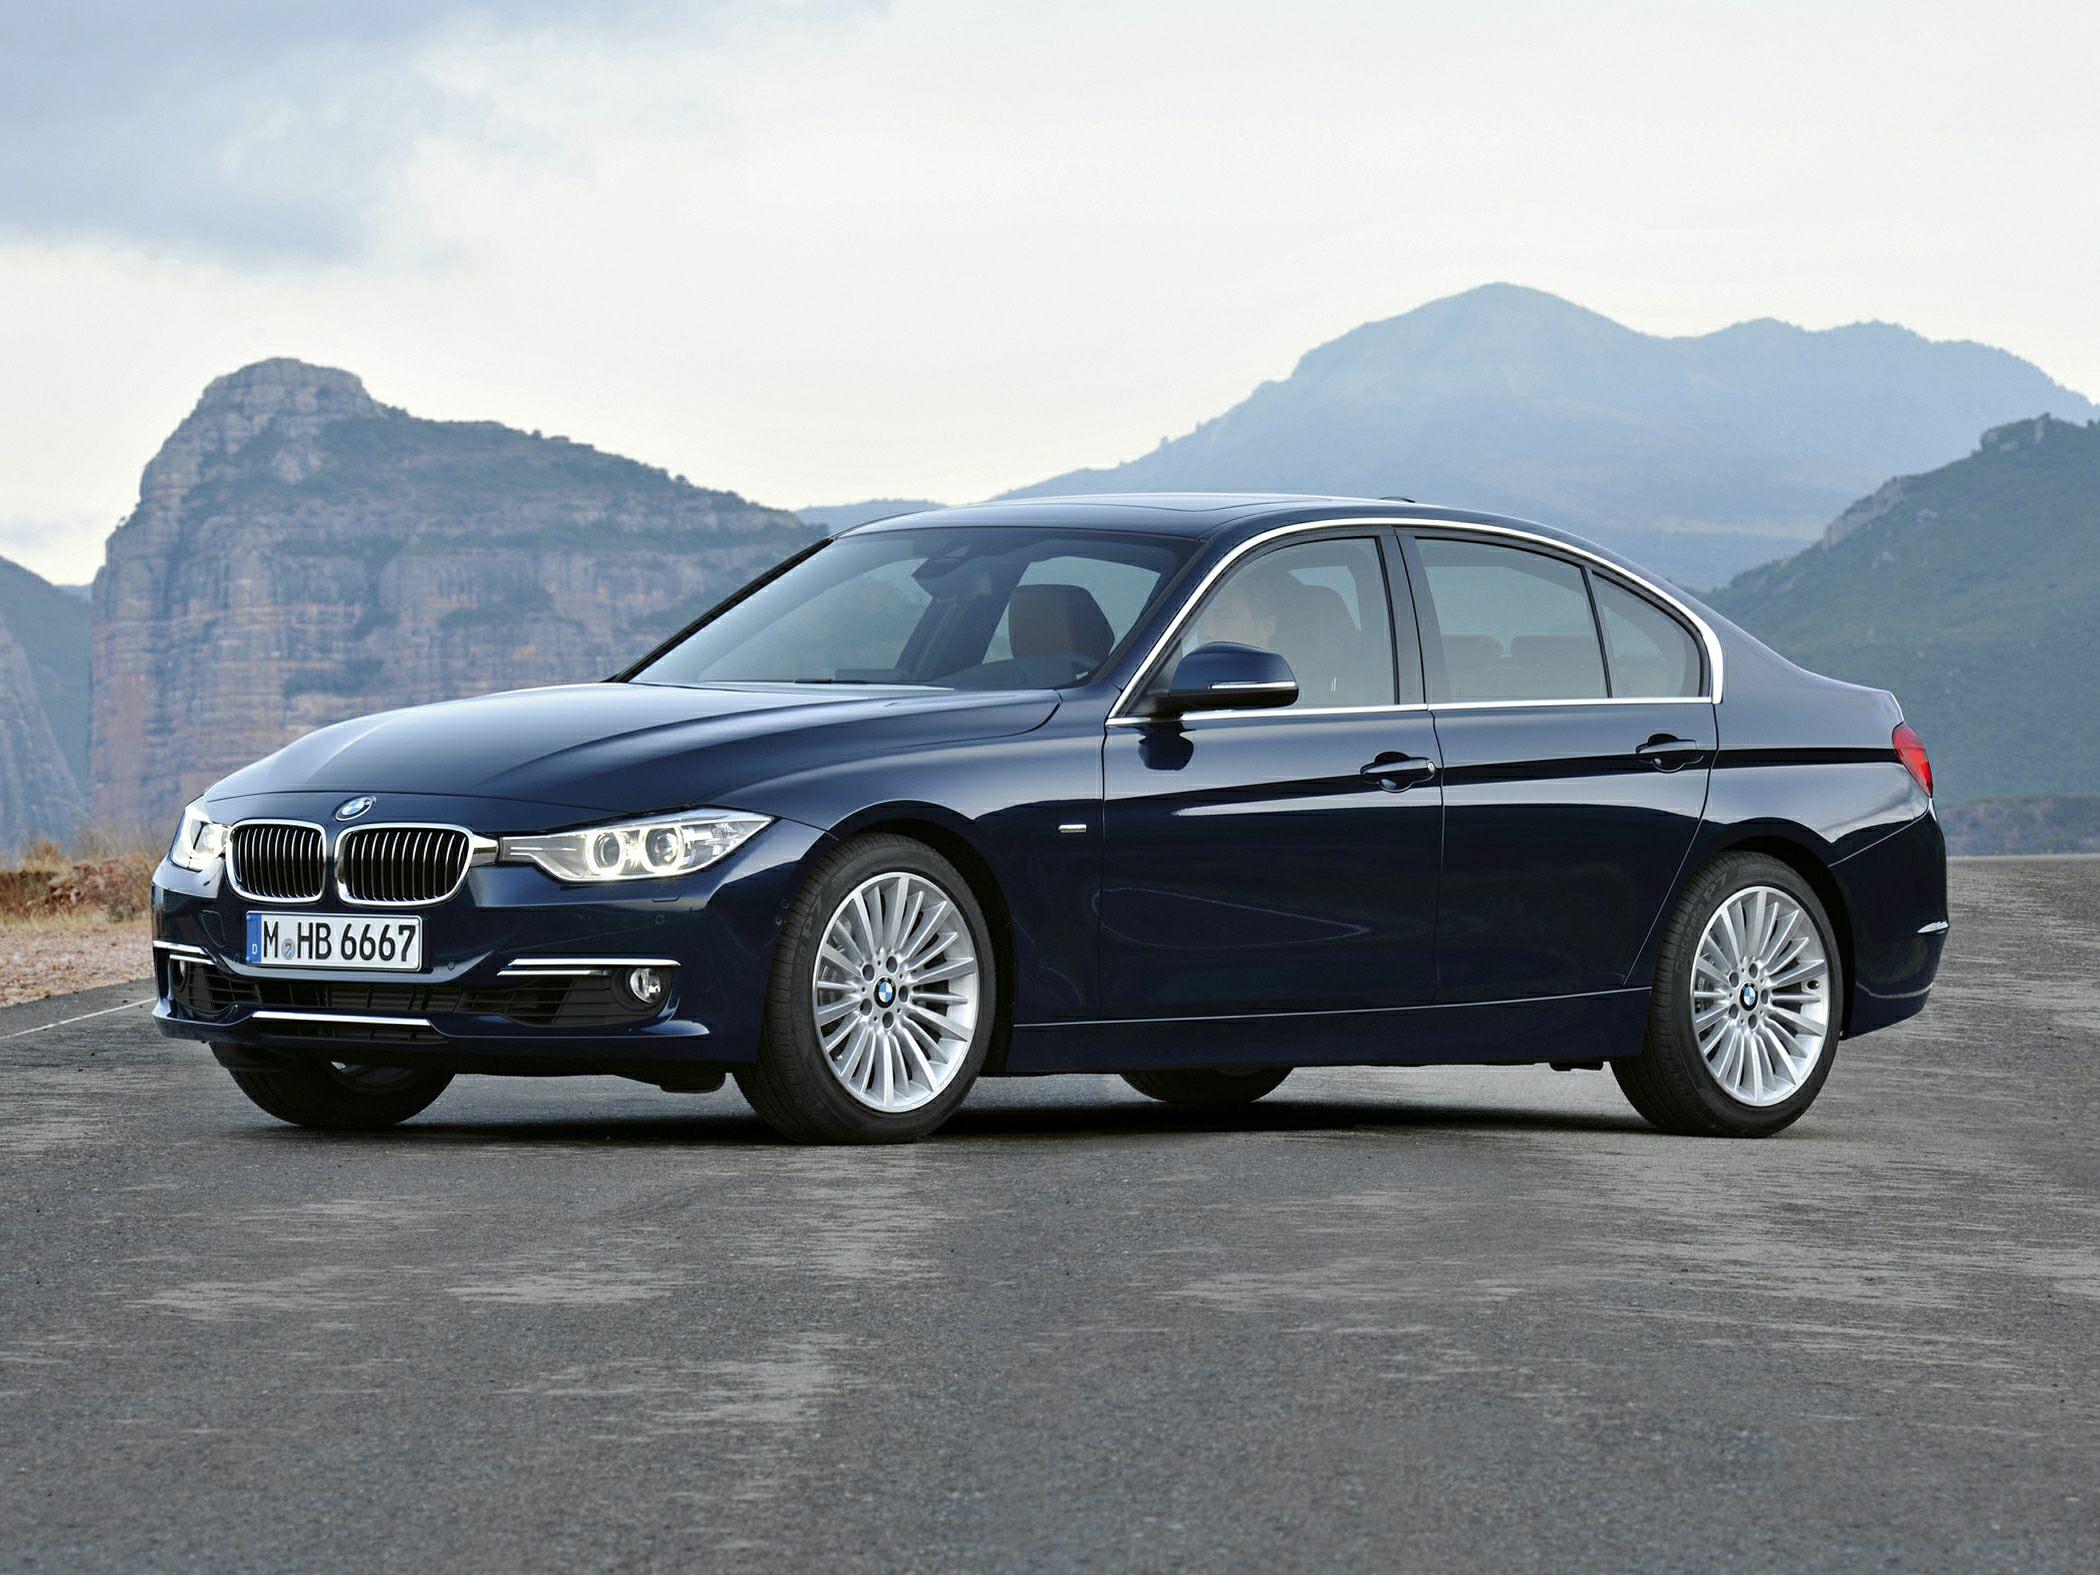 2014 BMW 335i Glam